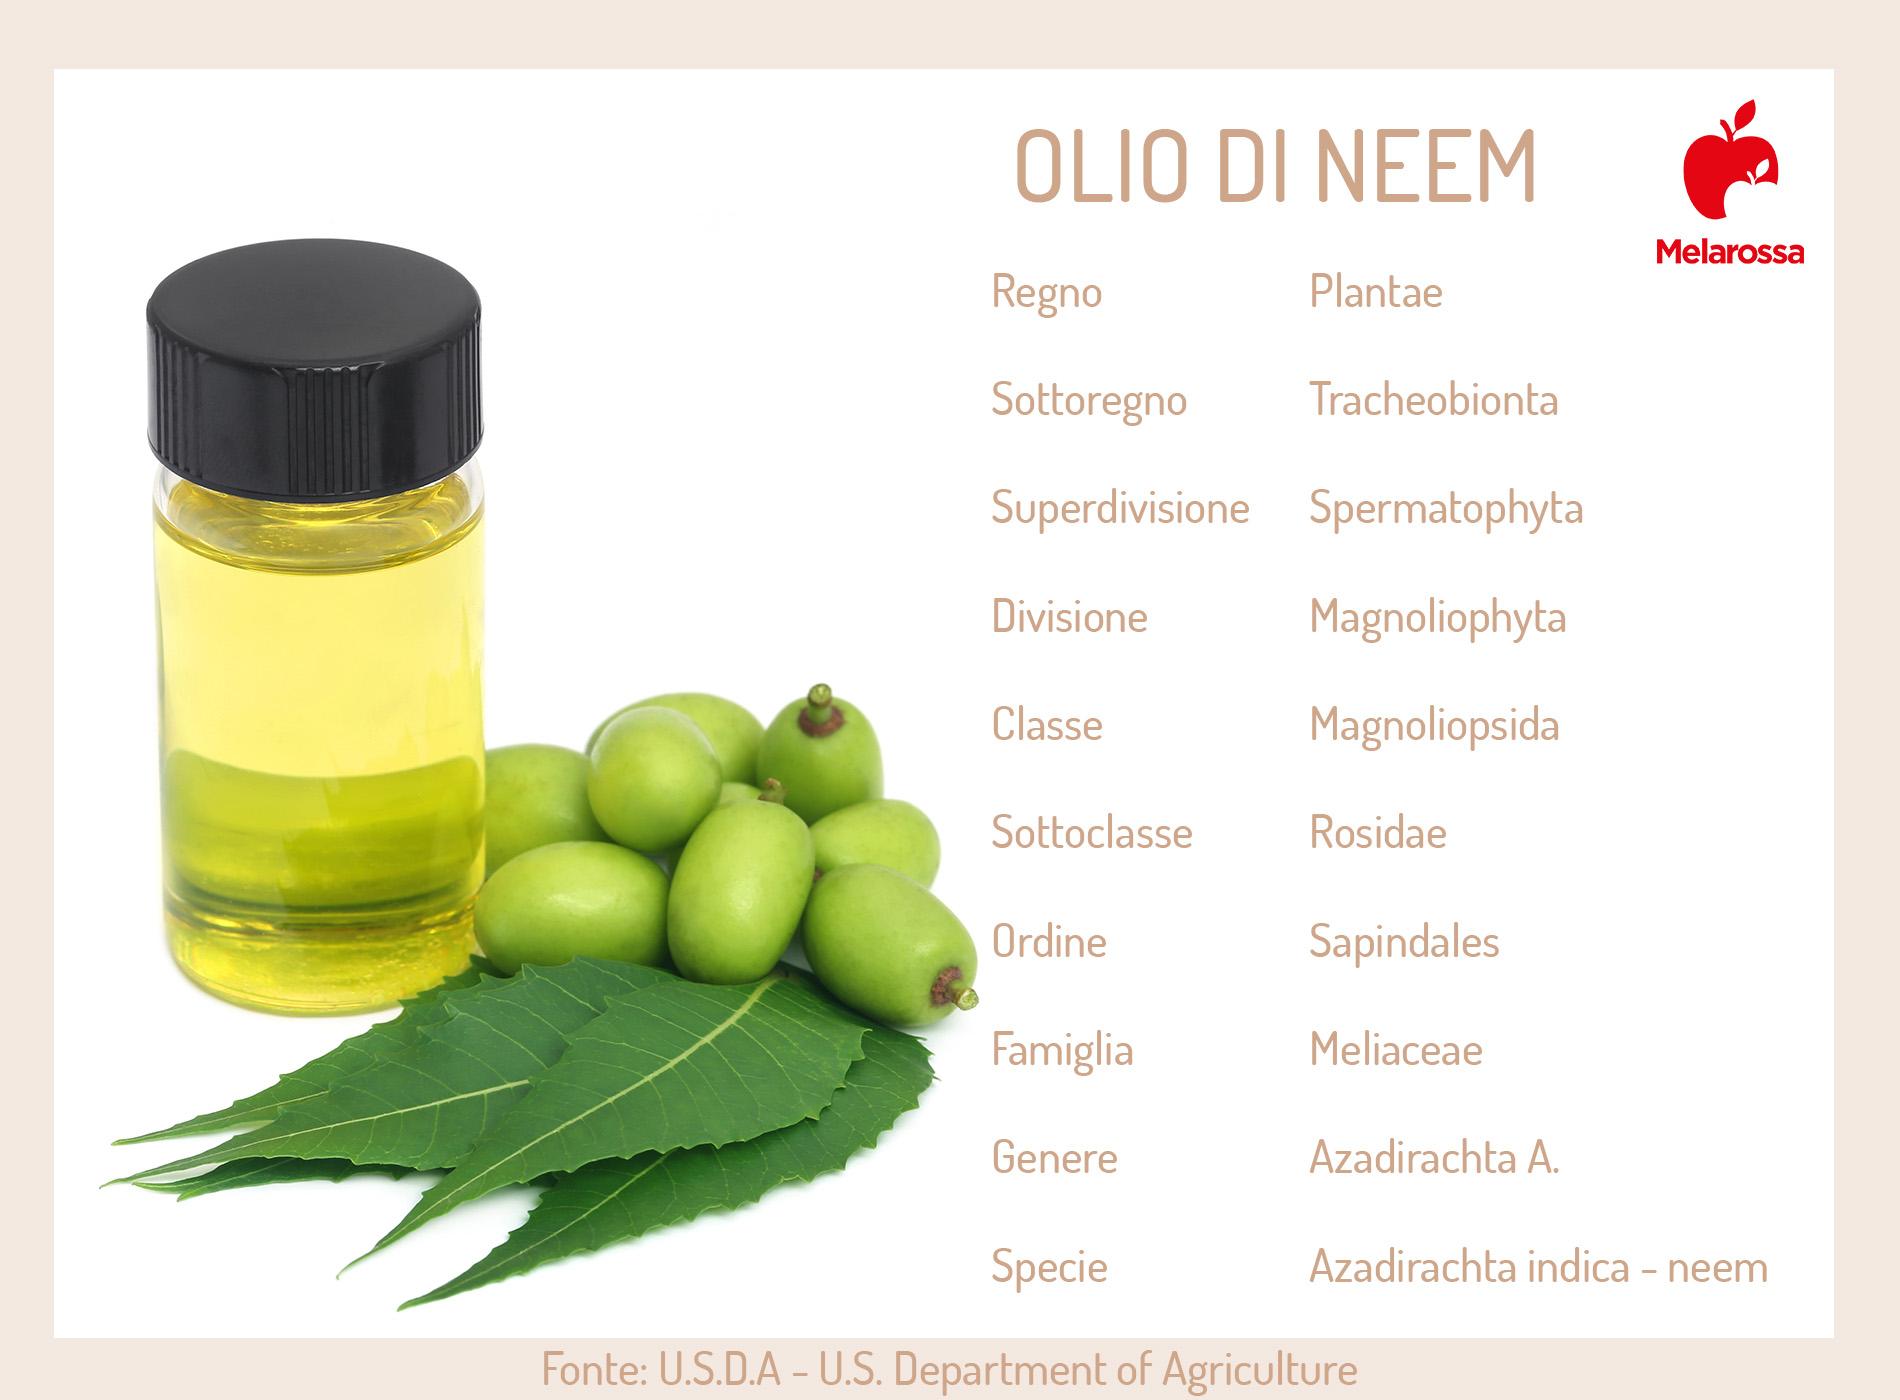 olio di neem cos'è